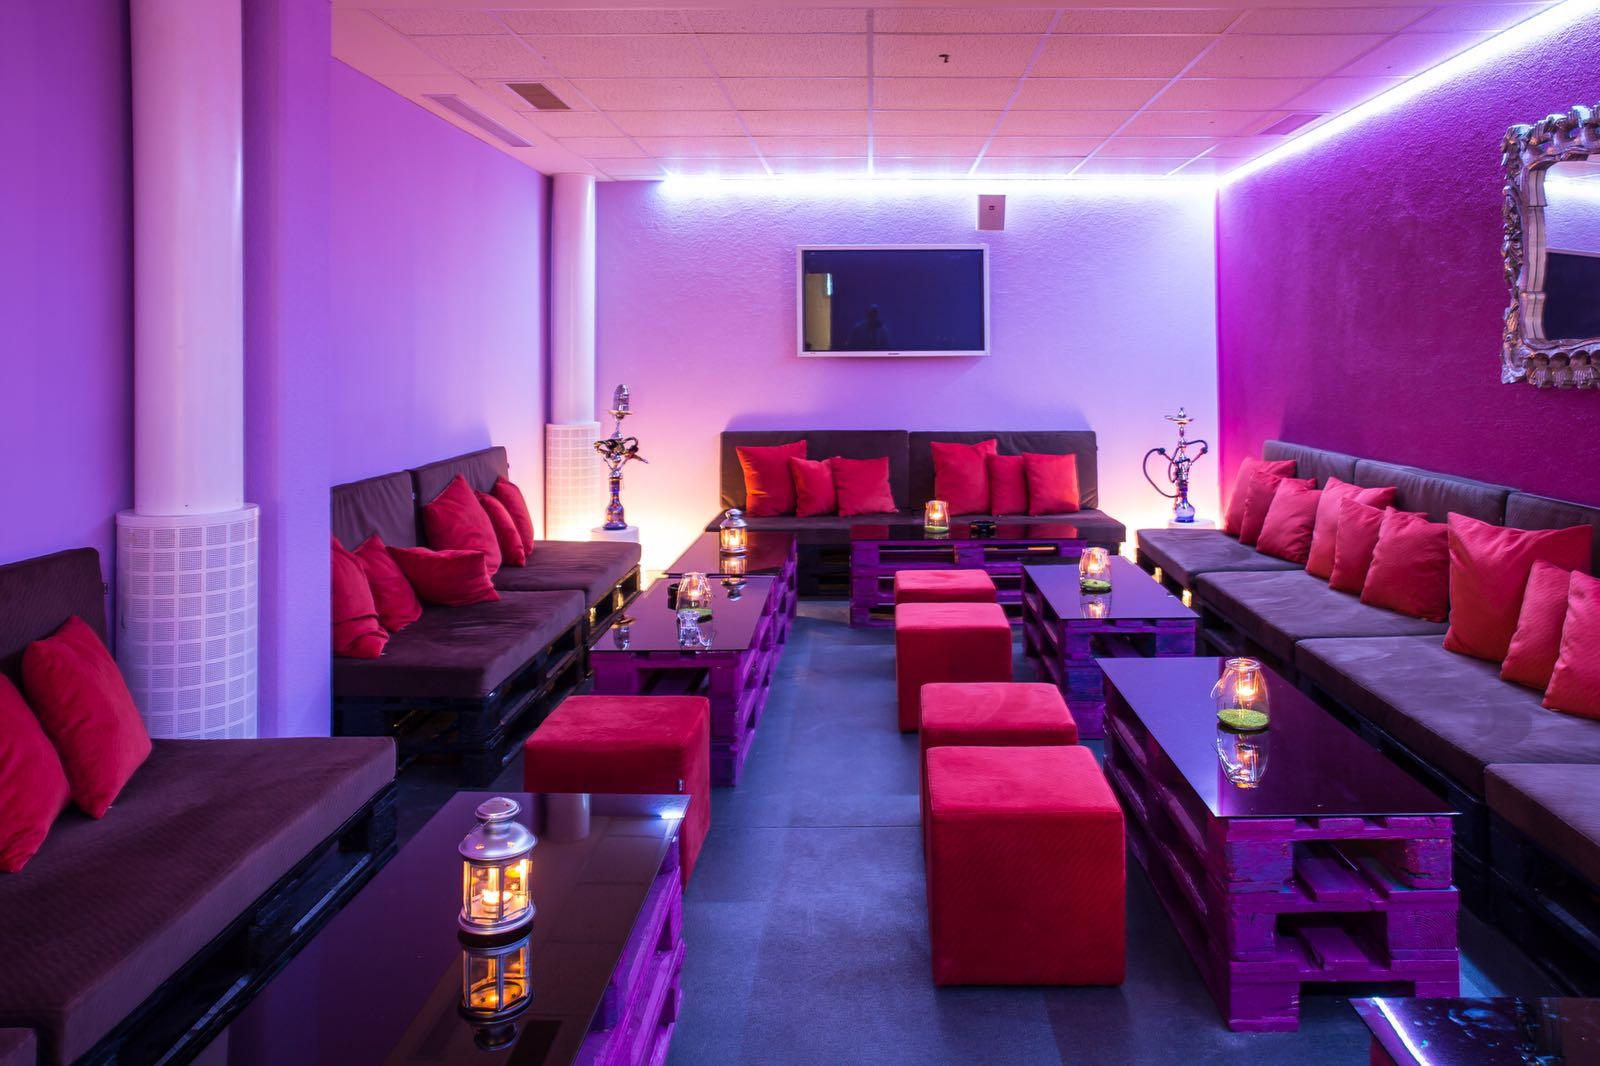 shishalounge restaurant bar dalmatino in bern niederwangen. Black Bedroom Furniture Sets. Home Design Ideas